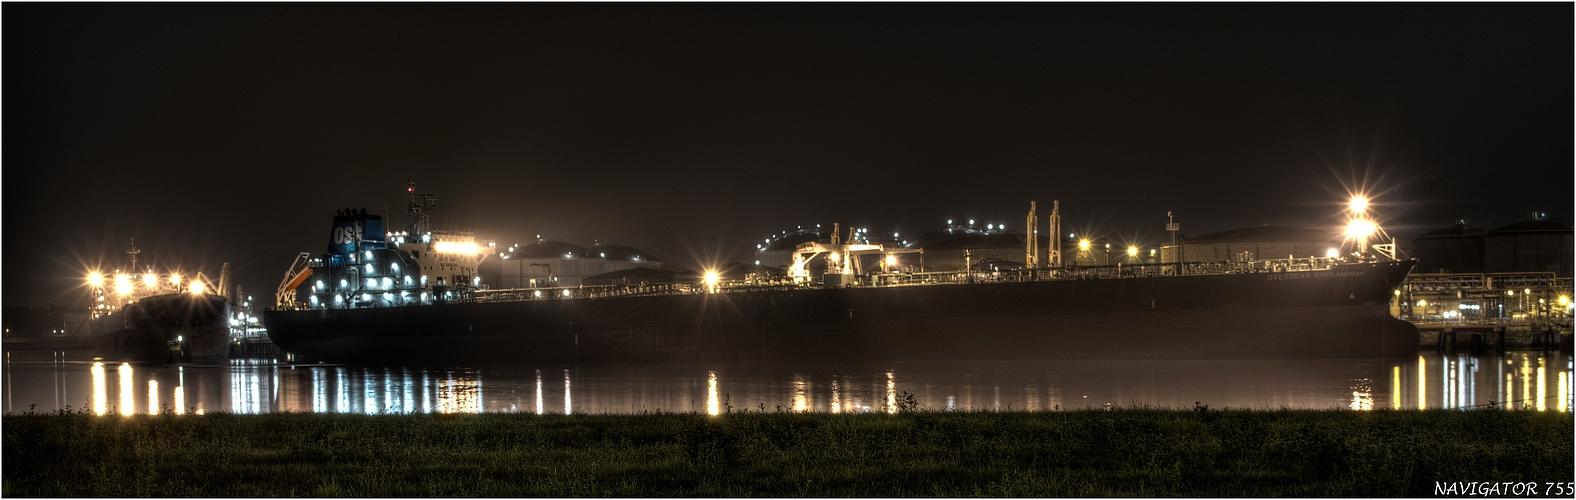 OVERSEAS SHENANDOAH / Crude Oil Tanker / Rotterdam / Bitte scrollen!